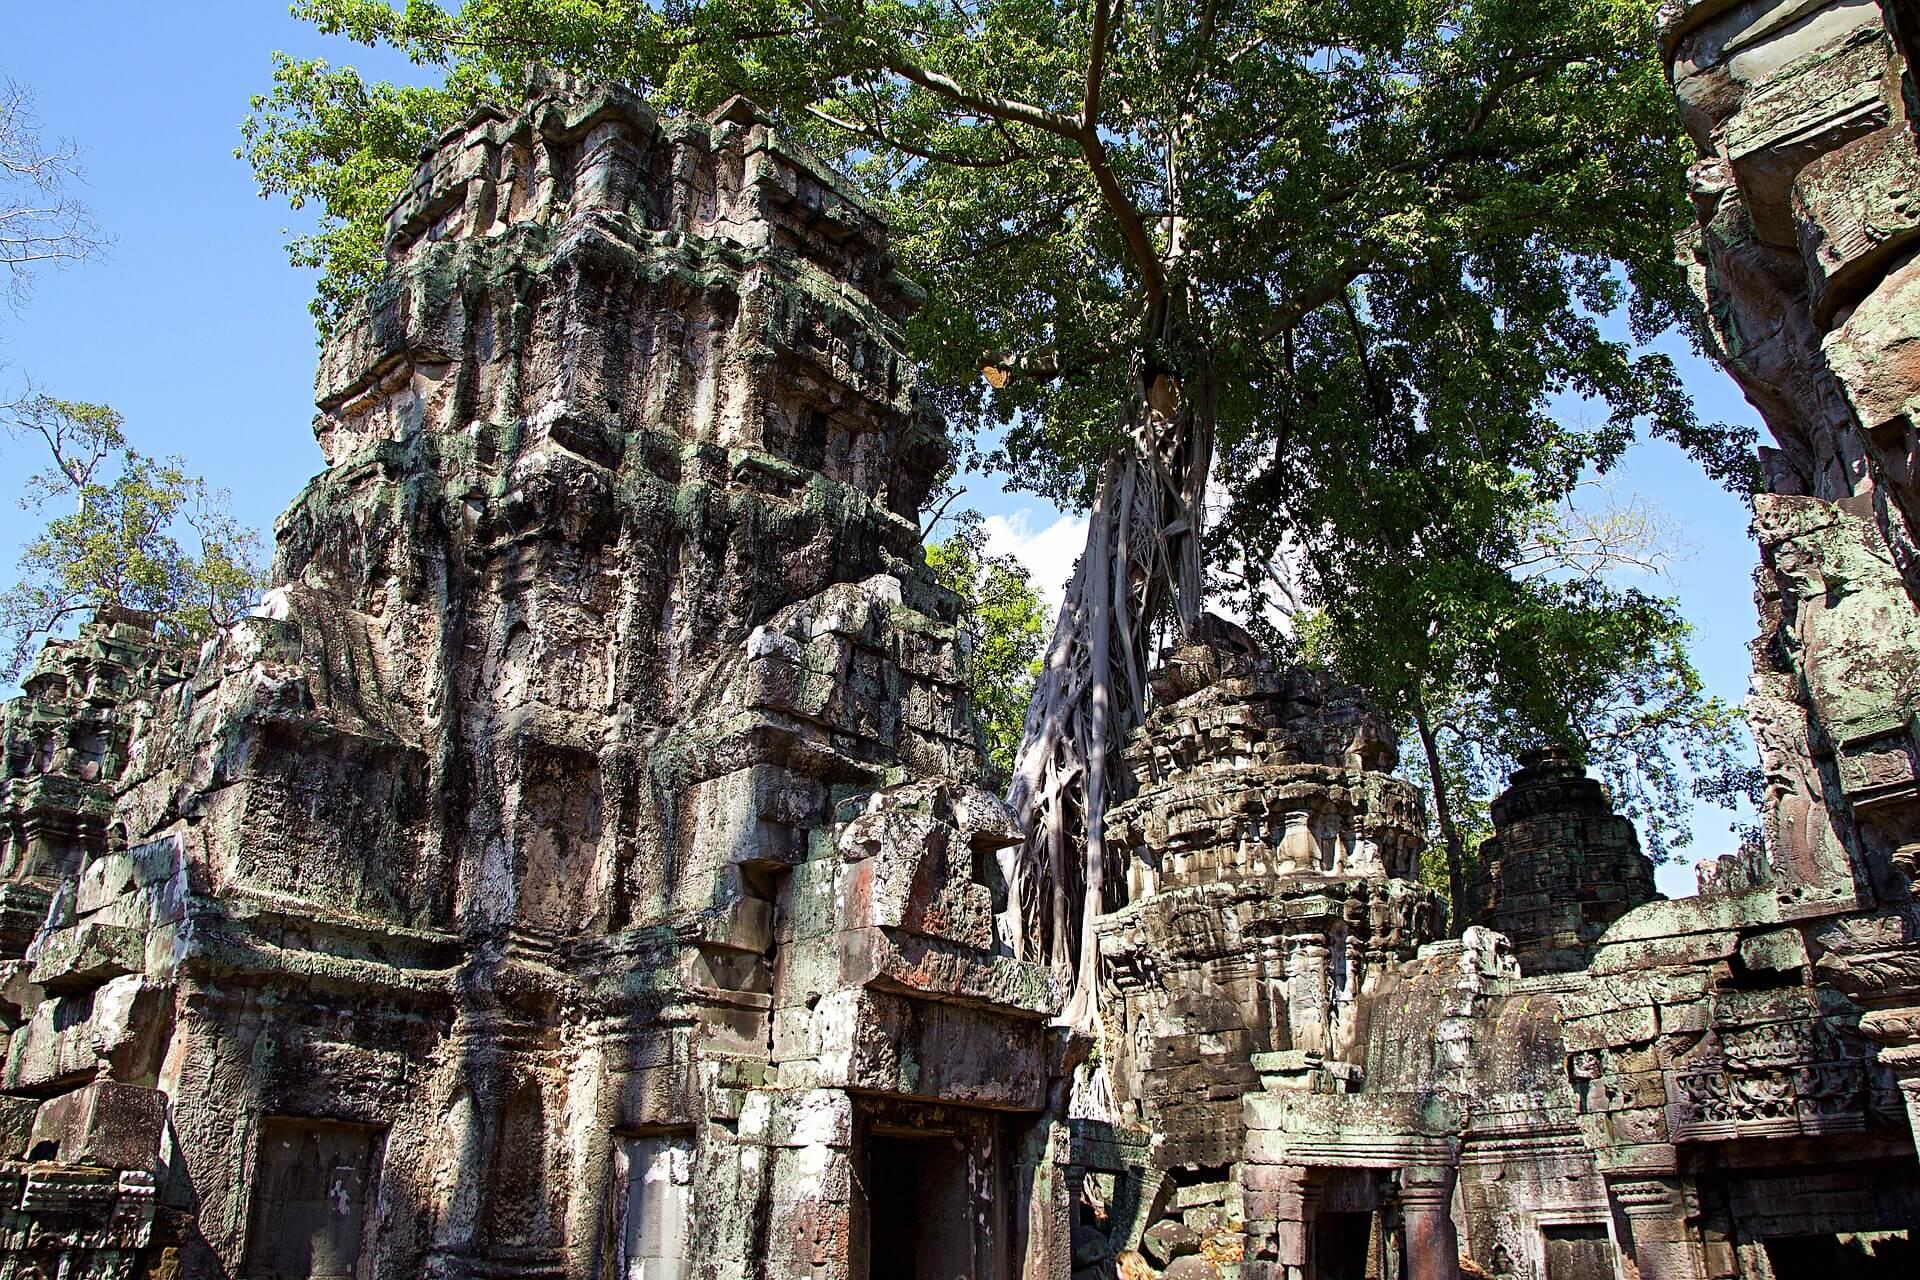 Phenom Penh to Siem Reap flights